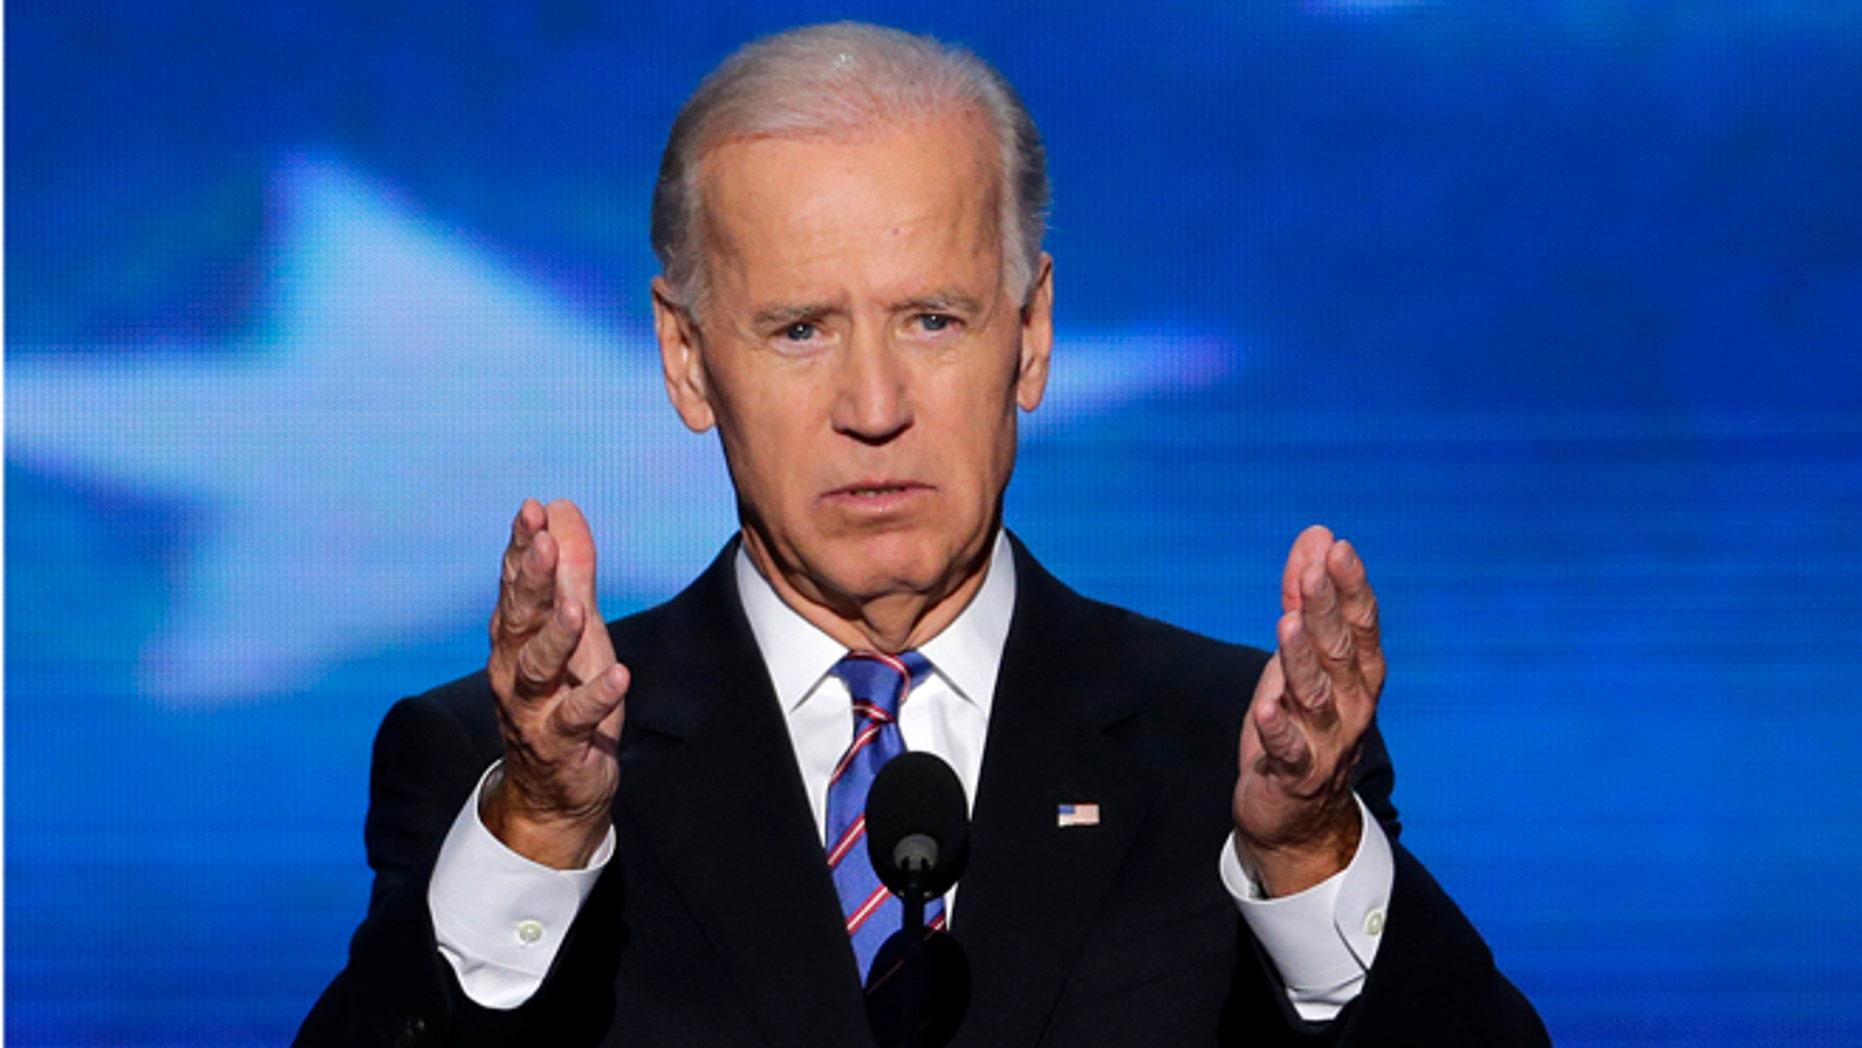 Sept. 6, 2012: Vice President Joe Biden addresses the Democratic National Convention in Charlotte, N.C.